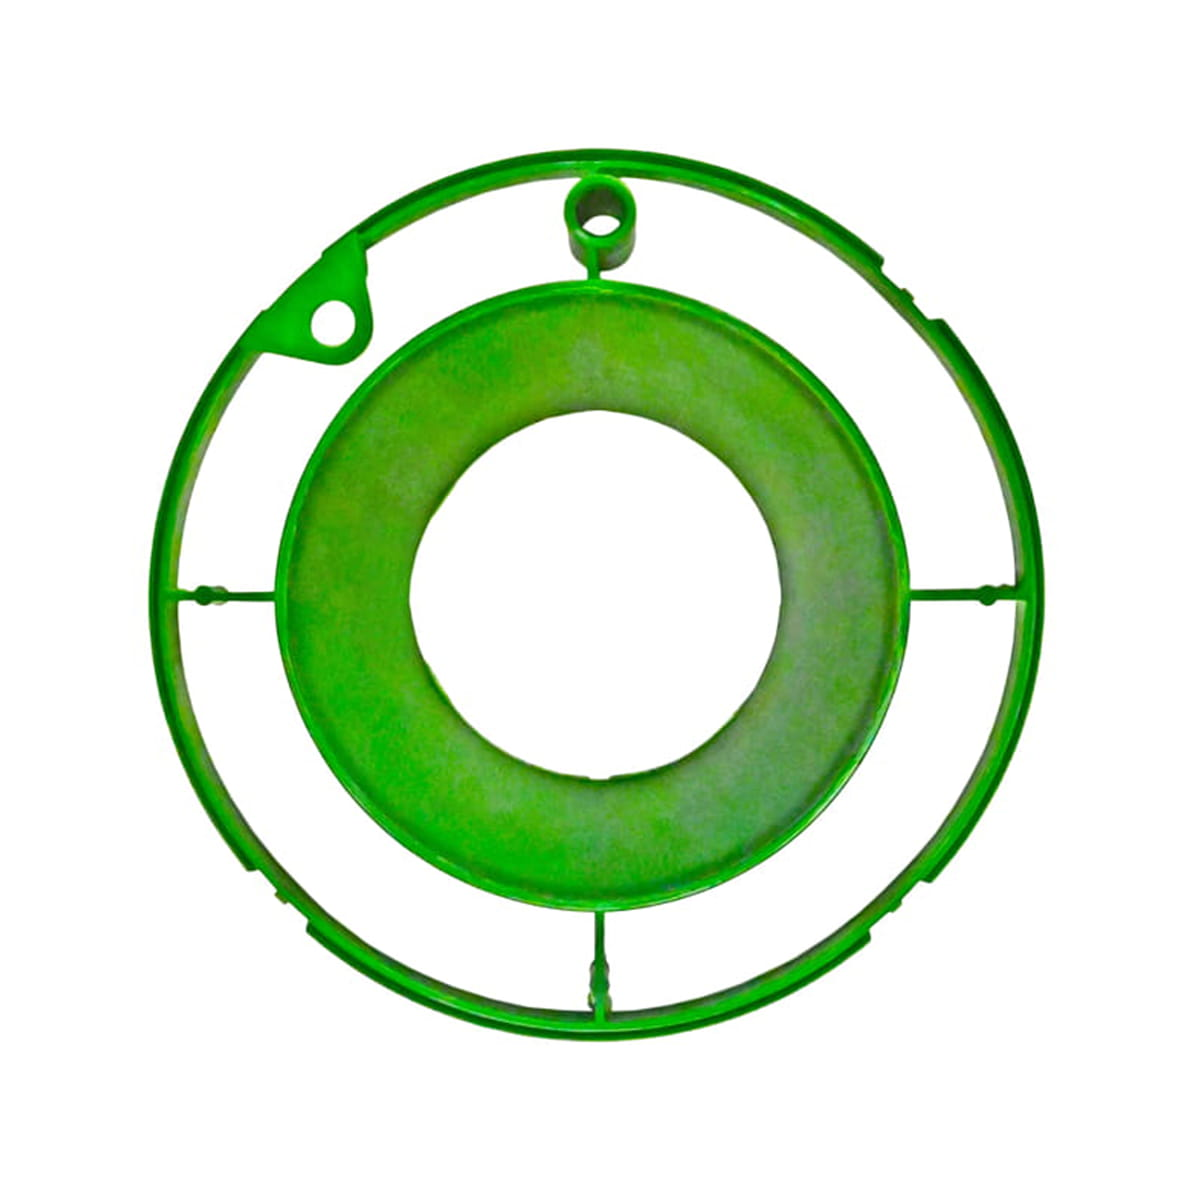 cono superior clutch verde base